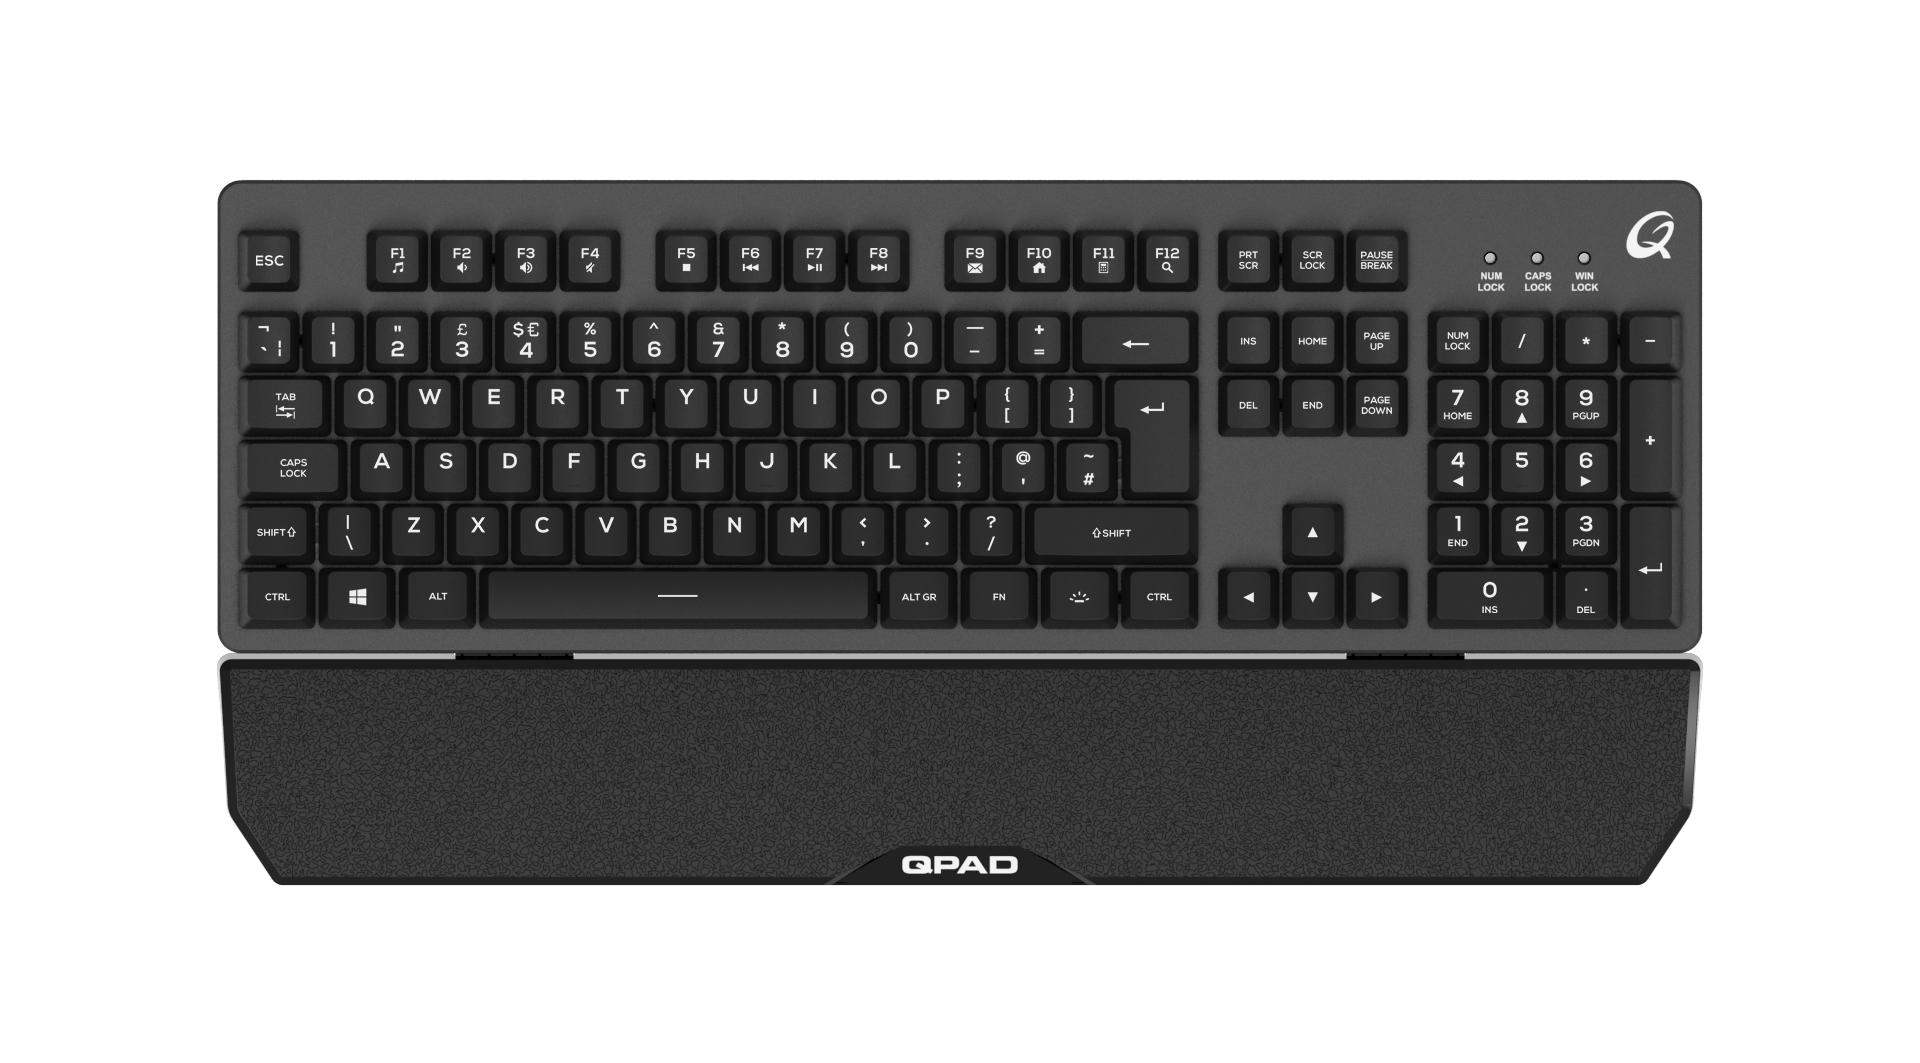 QPAD MK-40 - Standard - USB - Membran-Schlüsselschalter - QWERTY - RGB-LED - Schwarz